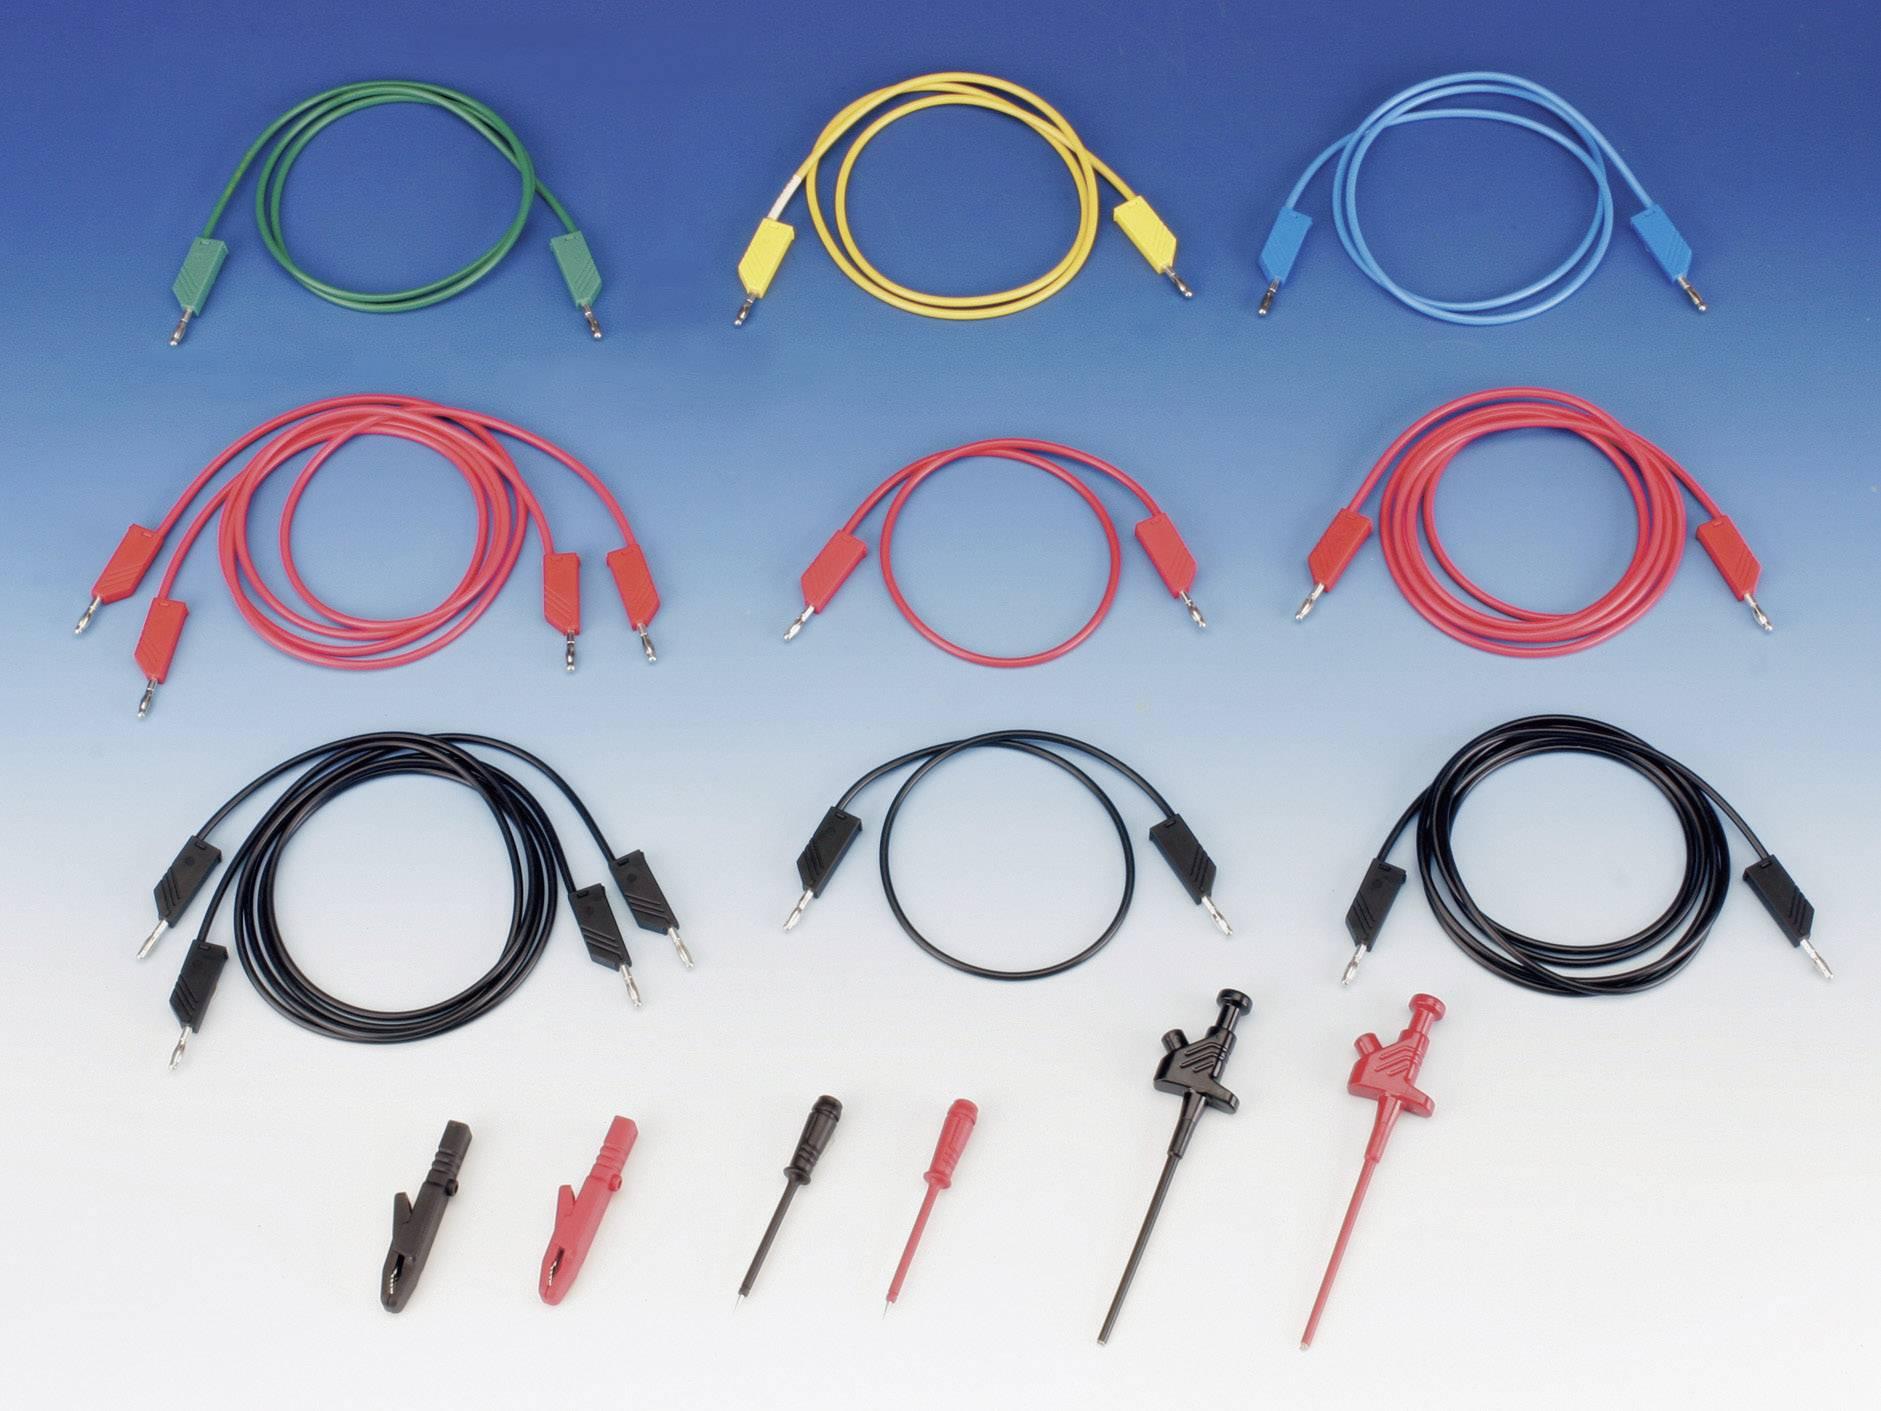 Sada měřicích kabelů banánek 4 mm ⇔ banánek 4 mm SKS Hirschmann CO ML, 1 m